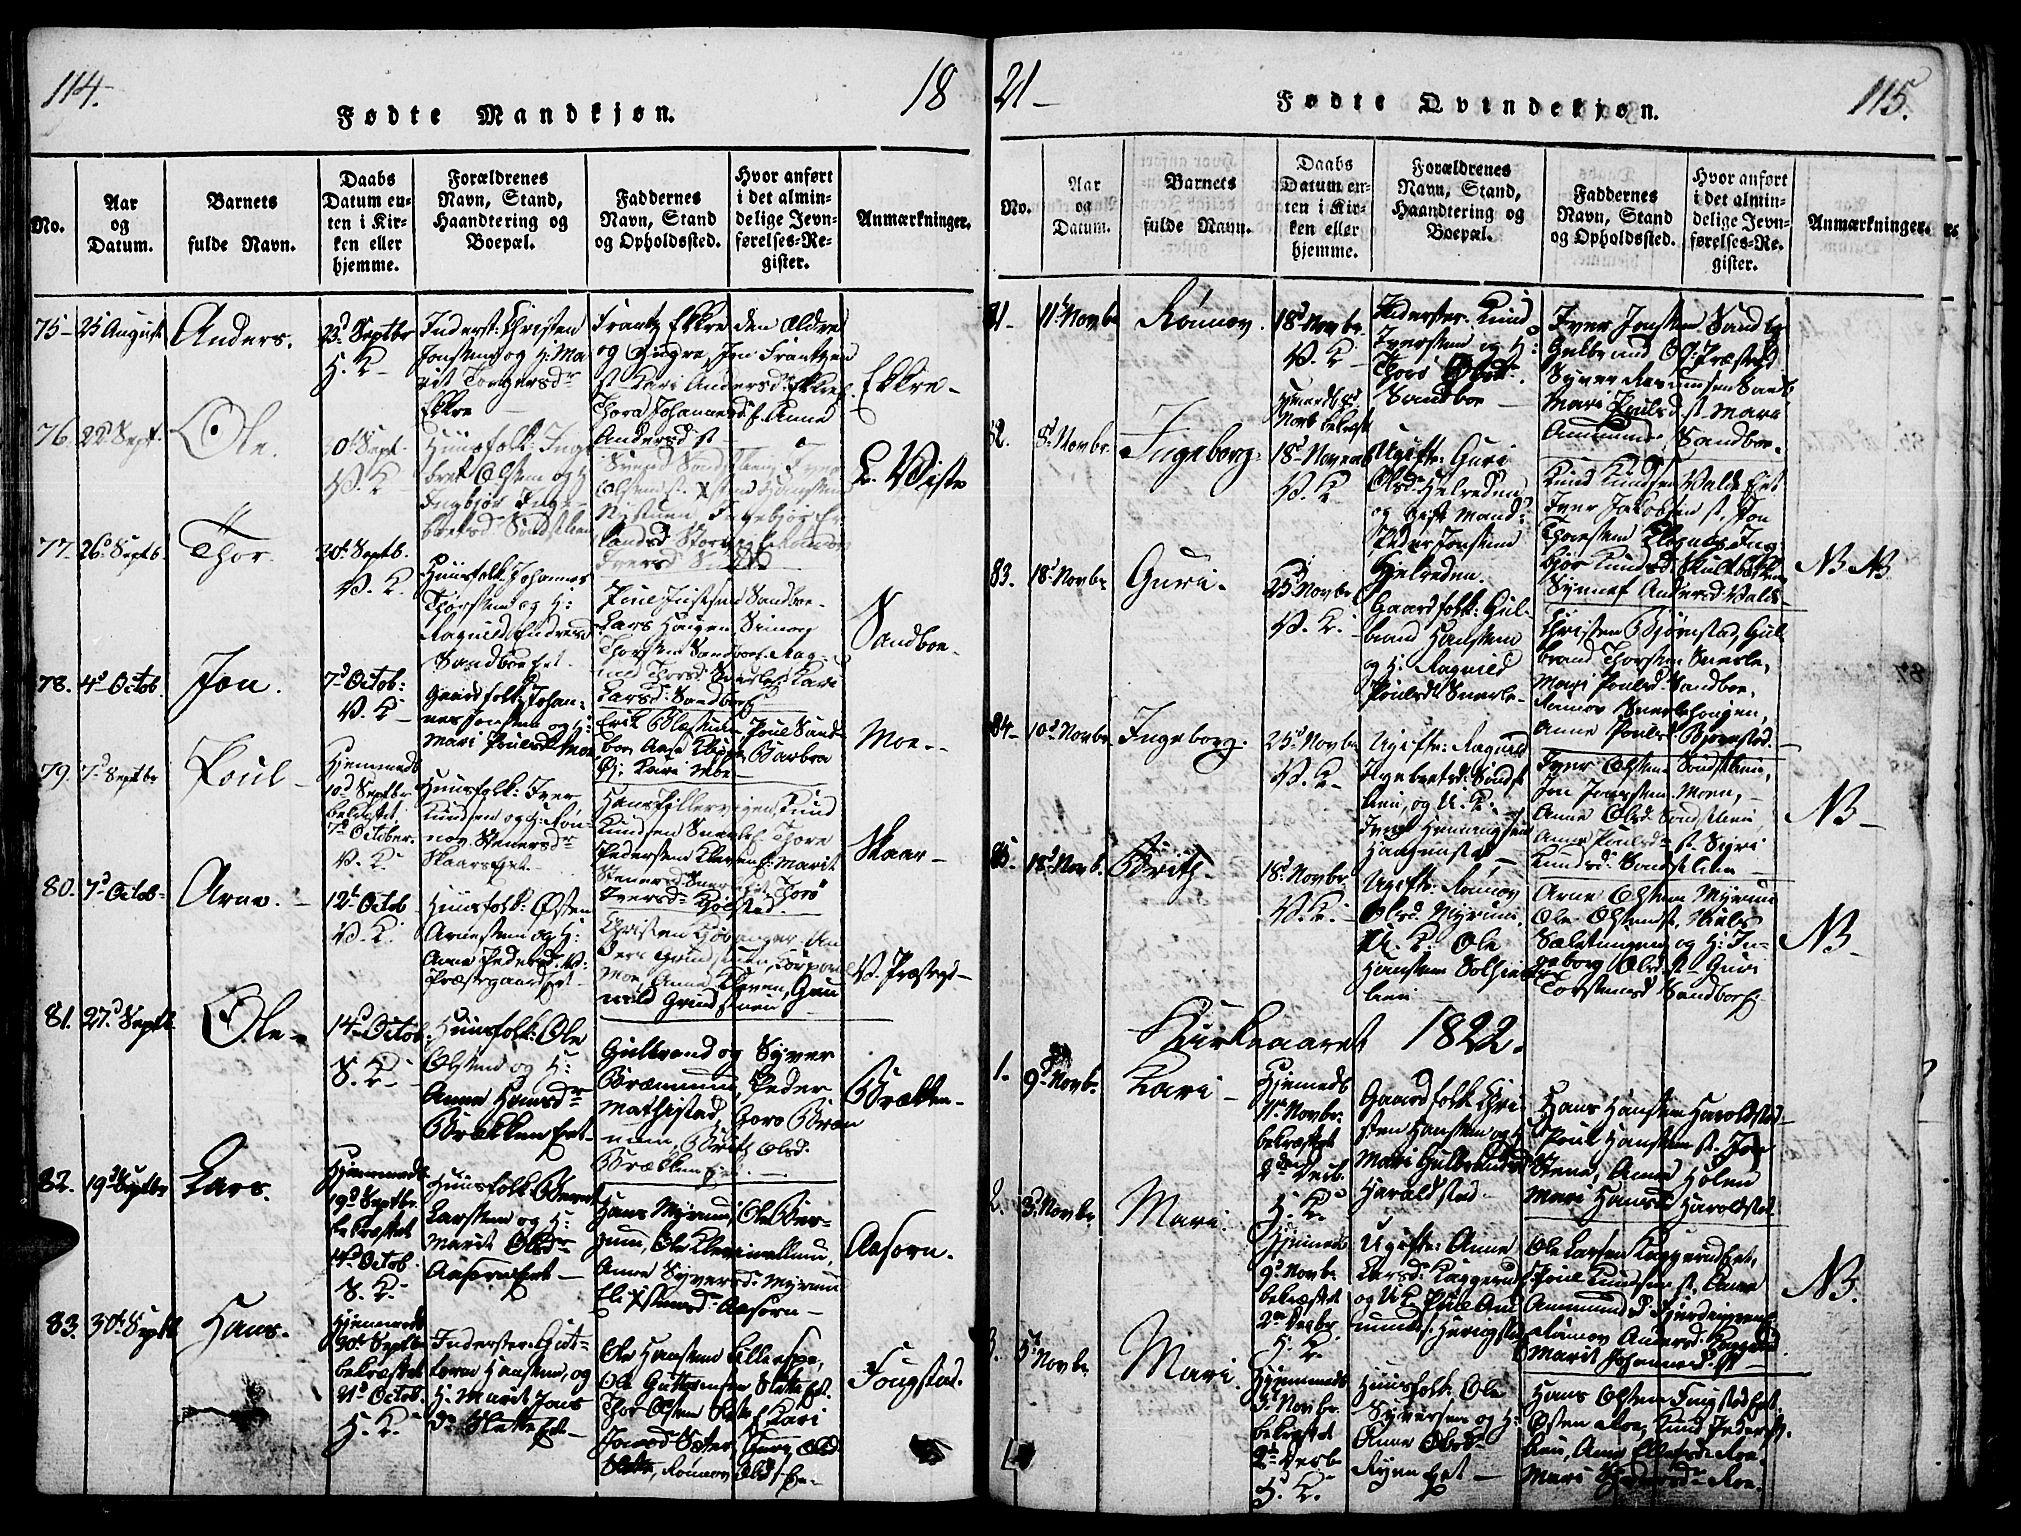 SAH, Vågå prestekontor, Ministerialbok nr. 3, 1815-1827, s. 114-115